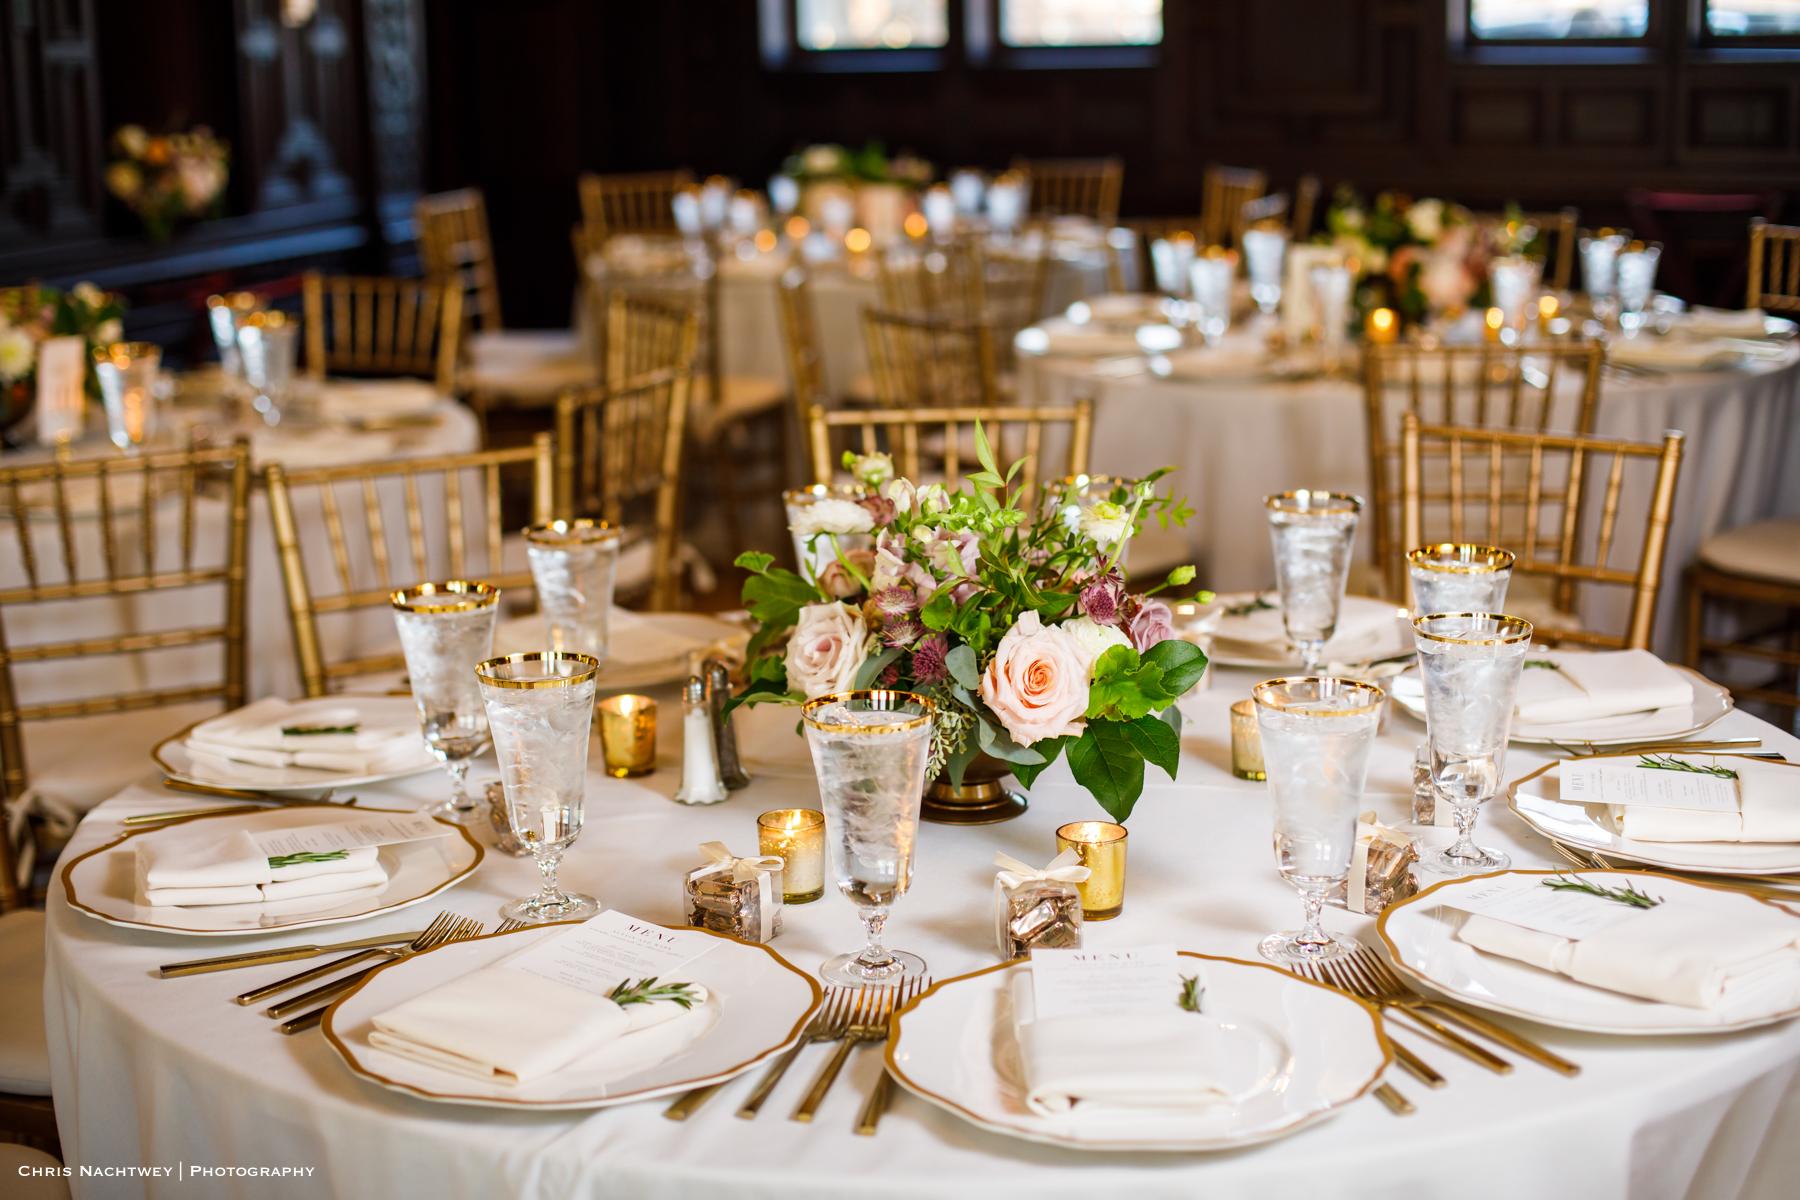 winter-branford-house-wedding-photos-groton-ct-chris-nachtwey-photography-2019-21.jpg